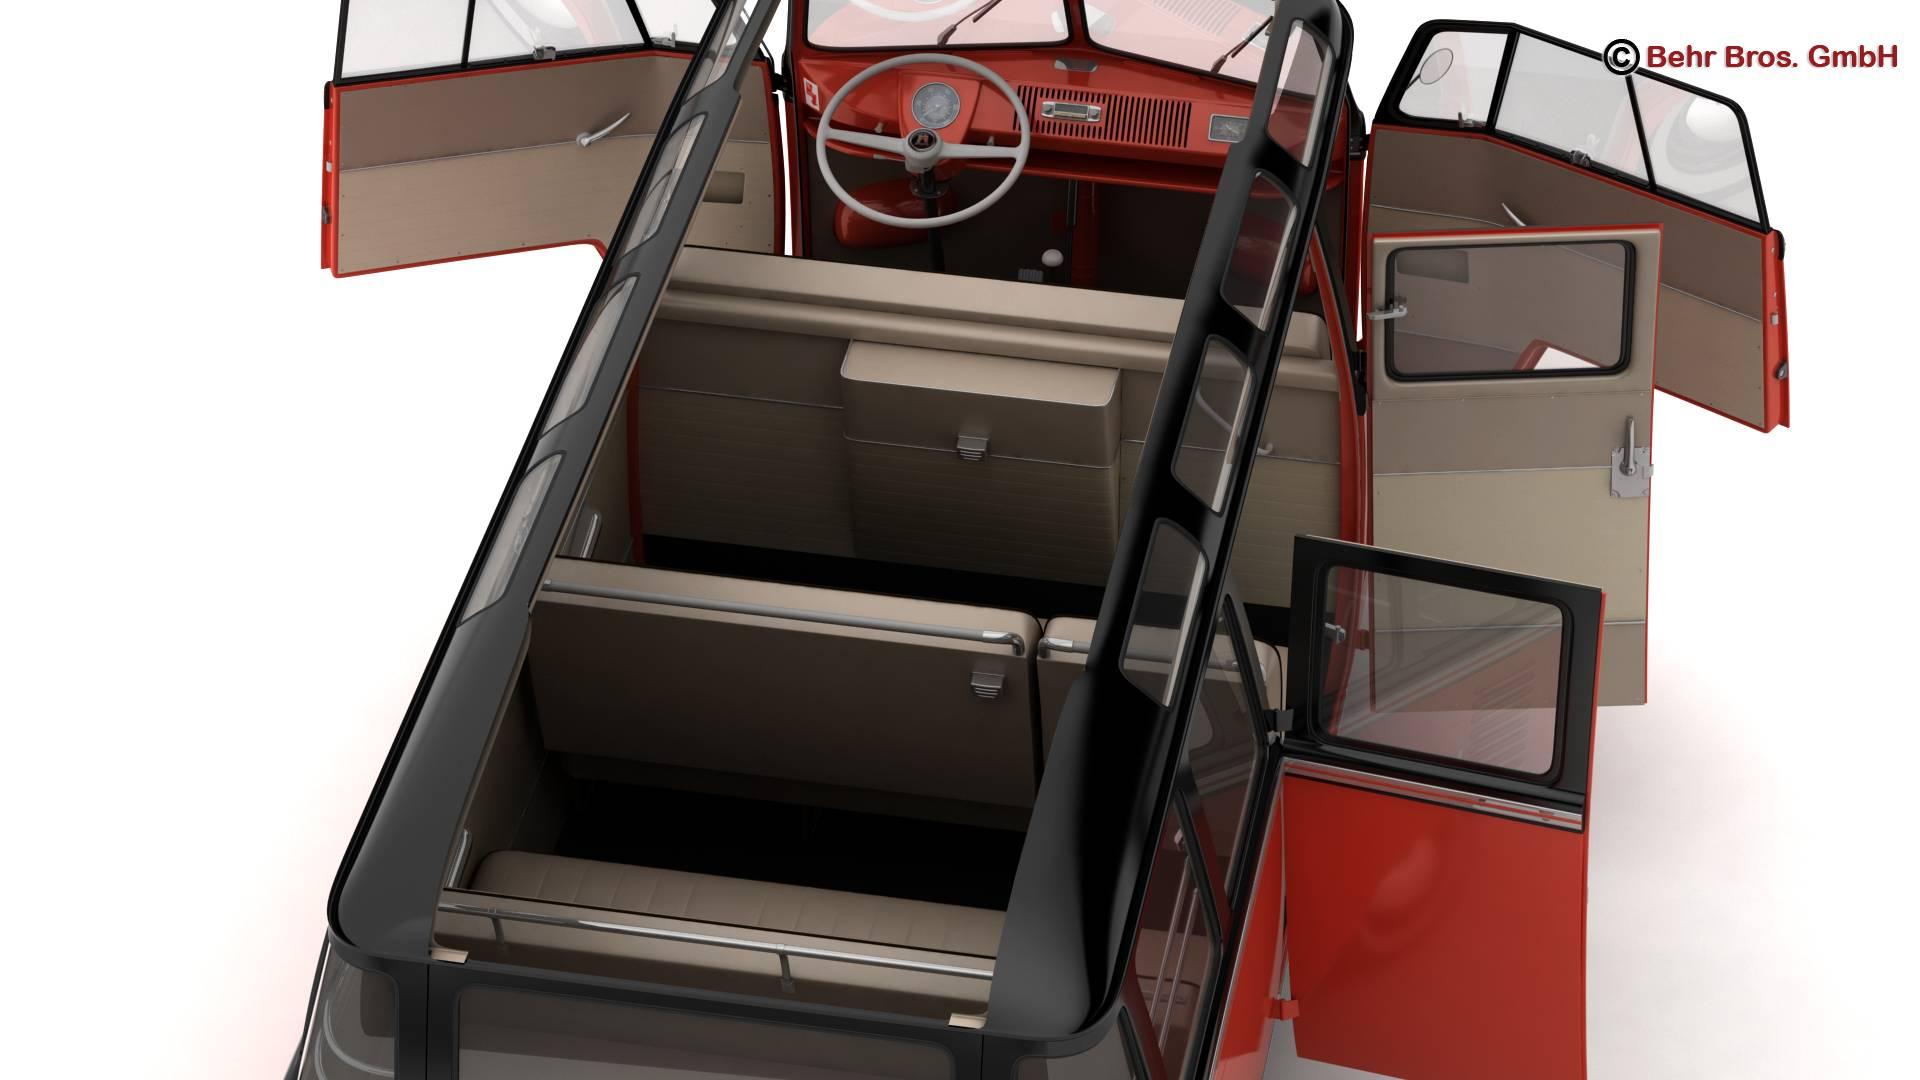 volkswagen type 2 samba 1959 3d model 3ds max fbx c4d lwo ma mb obj 217117